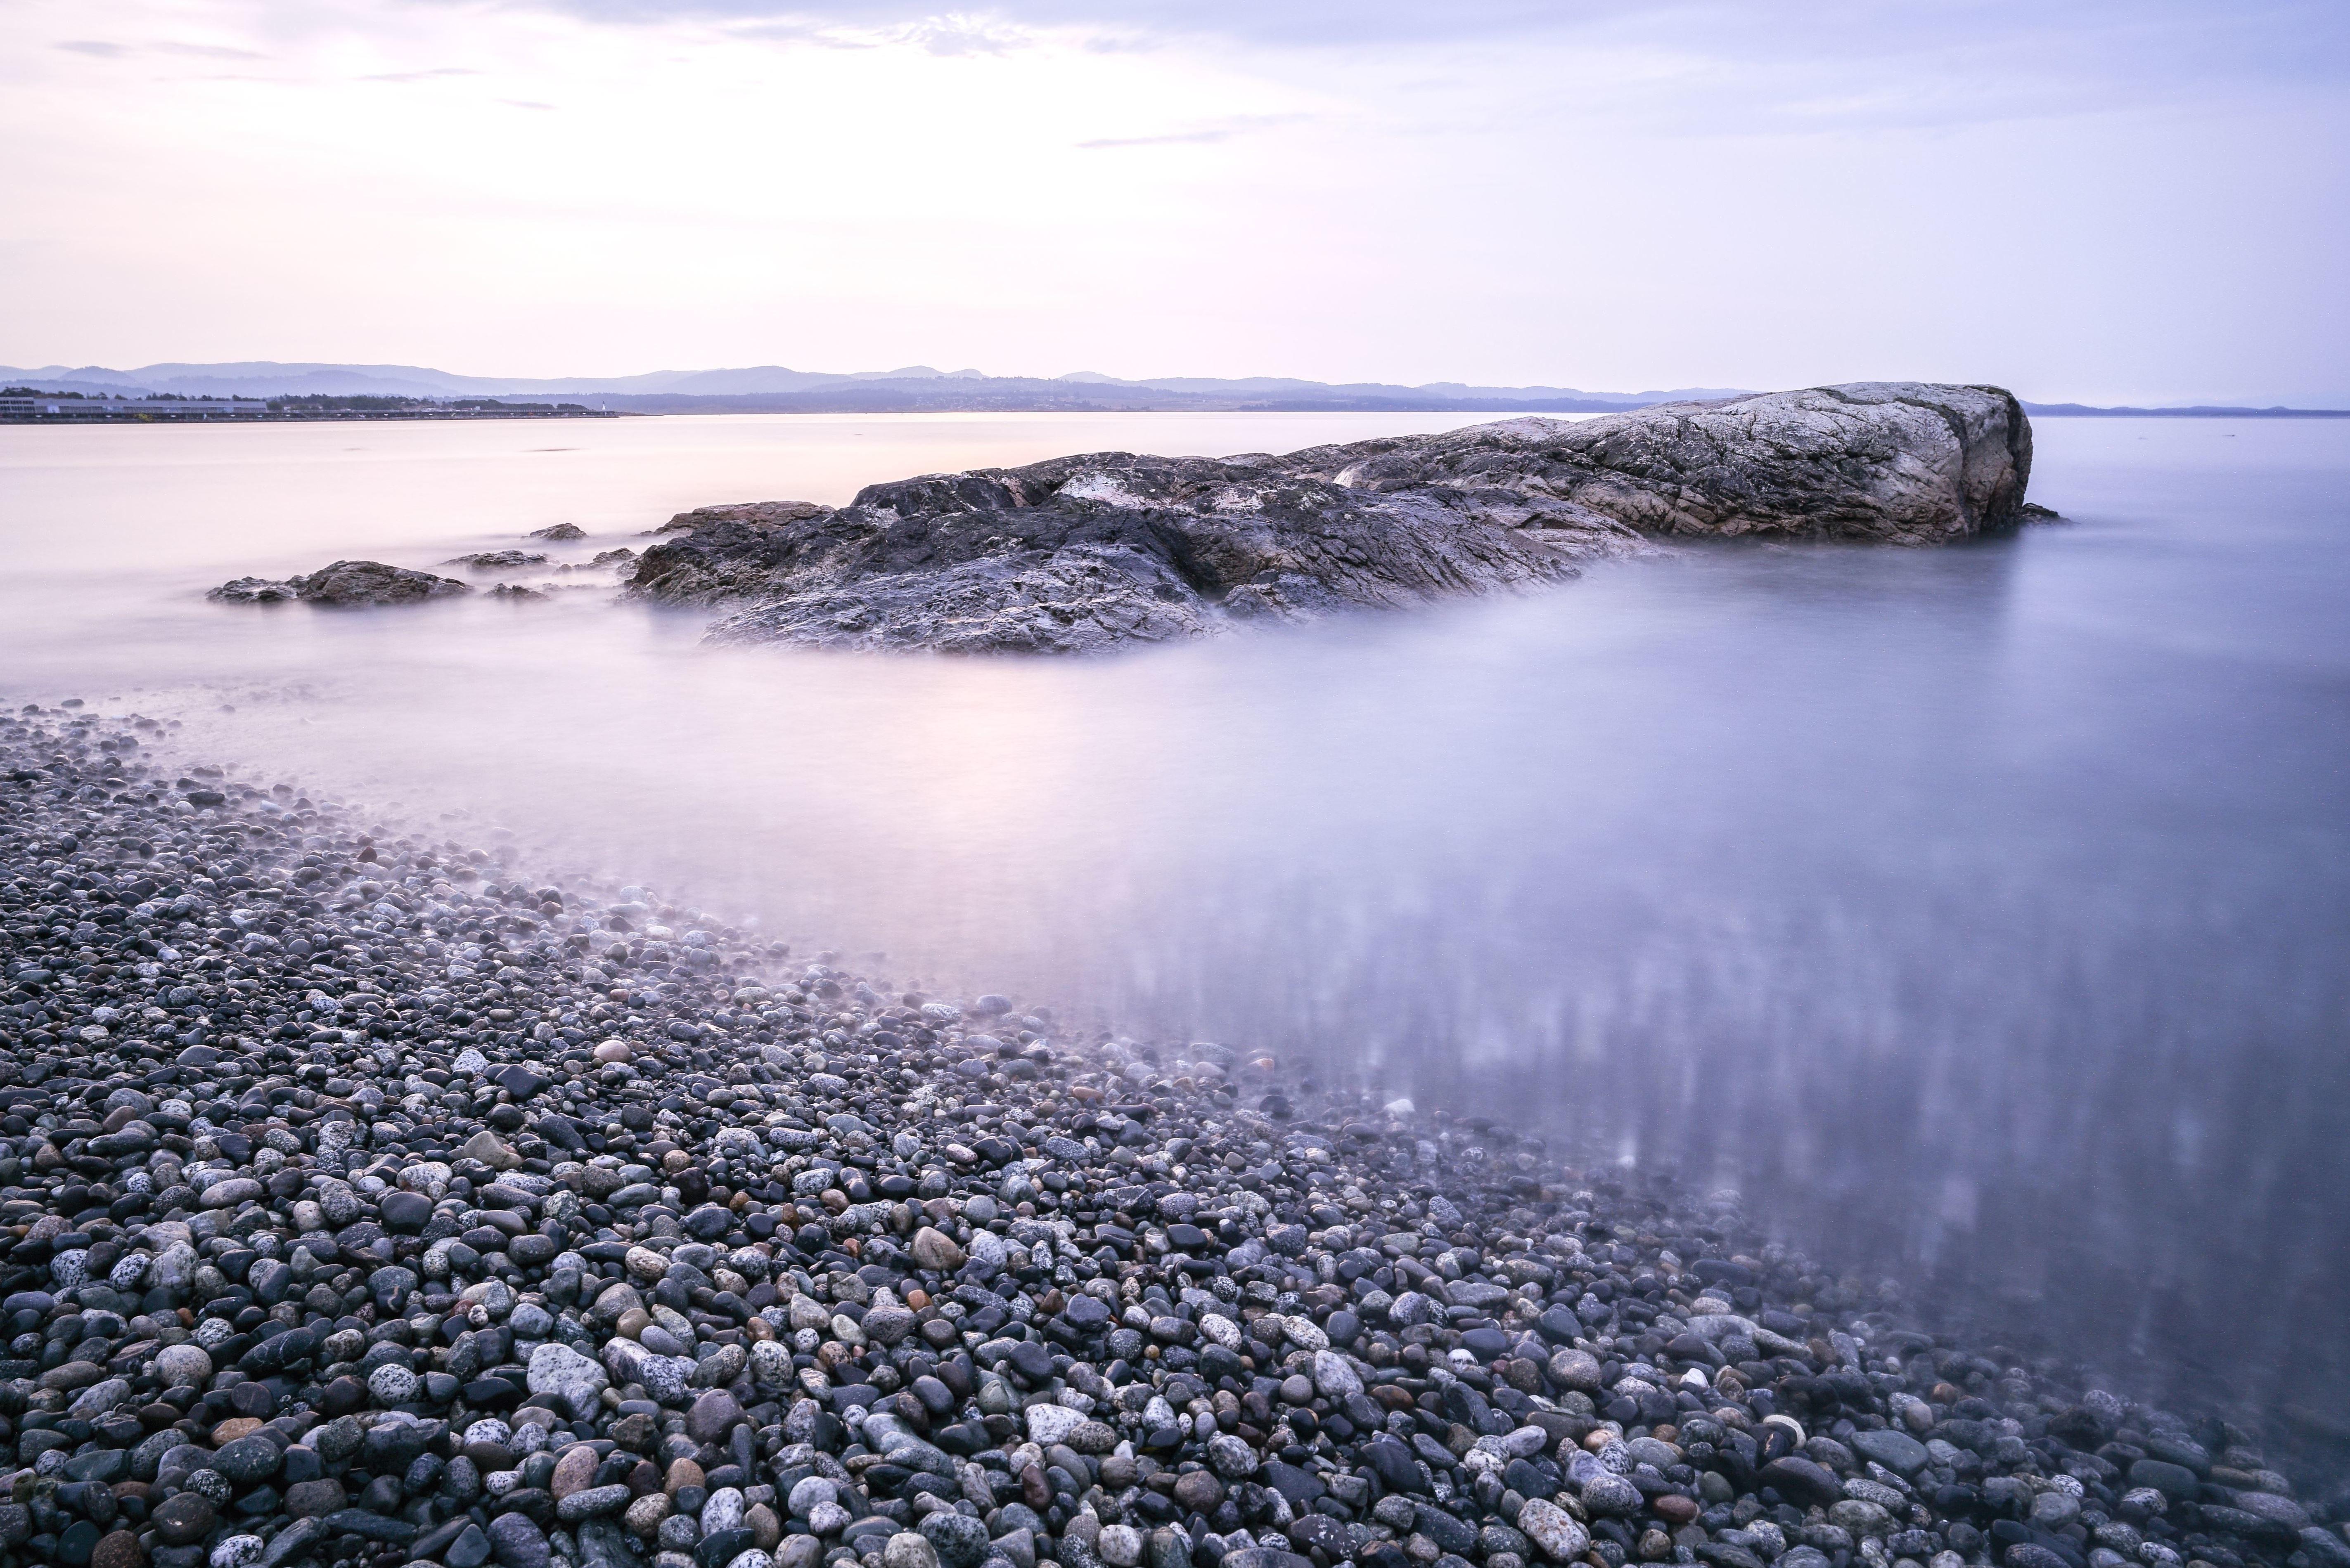 Kostenlose Bild: Kiesel, Felsen, Meer, Himmel, Stein, Wasser